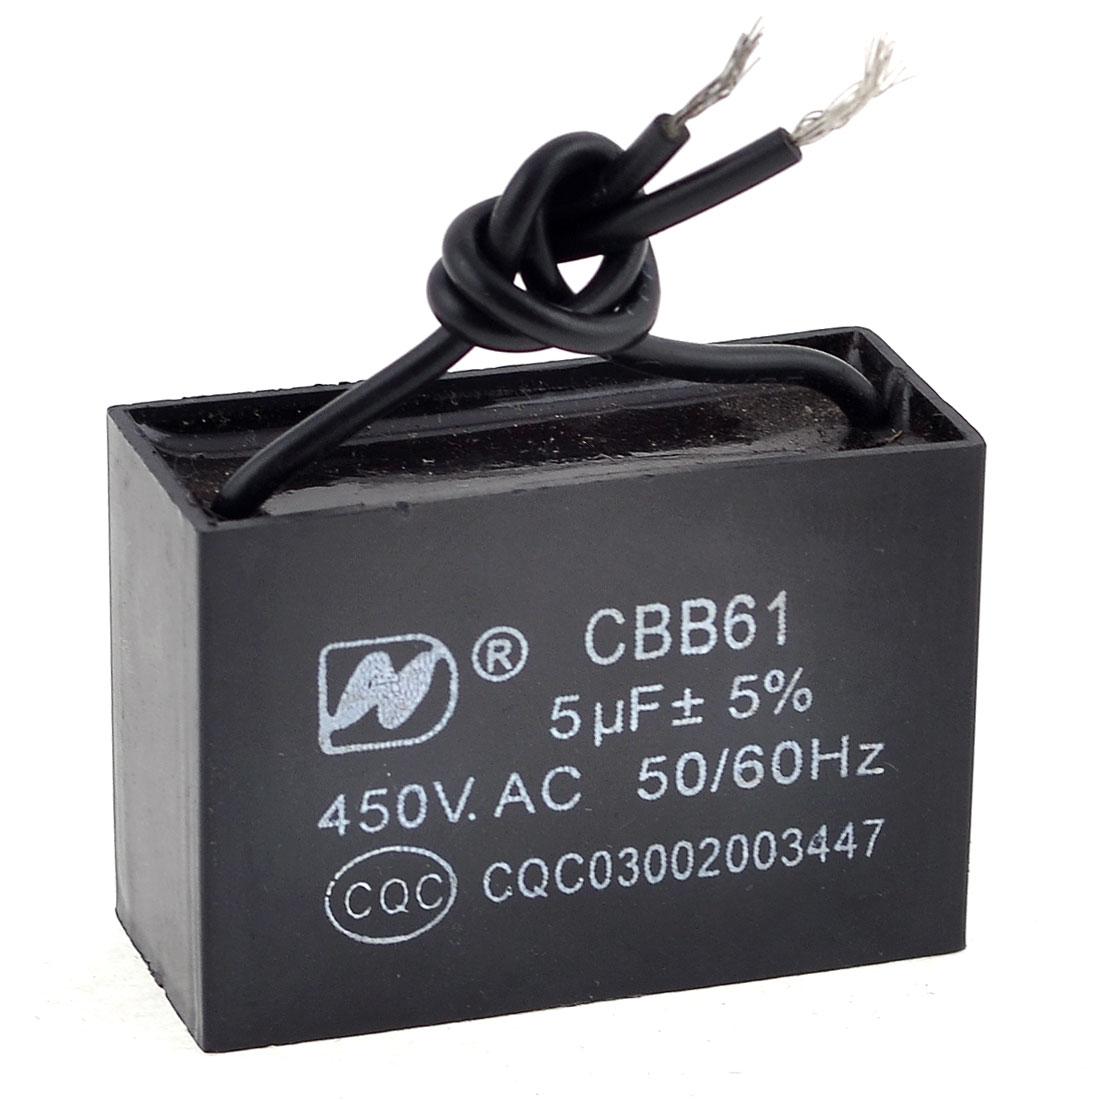 CBB61 Metalized Polypropylene Film Motor Run Capacitor AC 450V 5uF